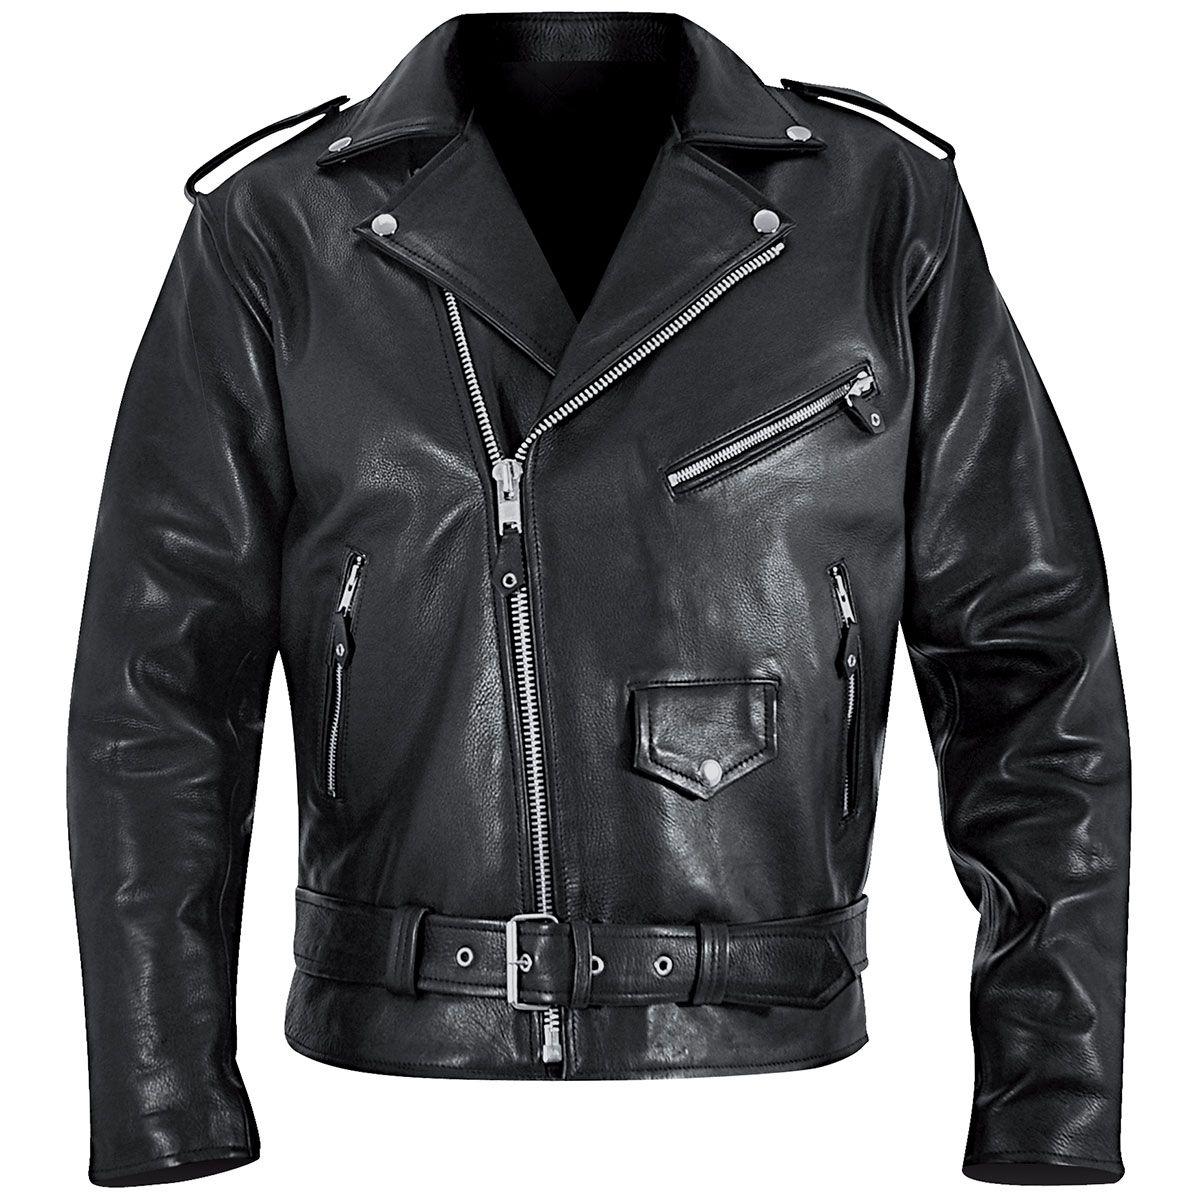 blouson cuir mec osx brando jacket vestes blousons rock a gogo. Black Bedroom Furniture Sets. Home Design Ideas